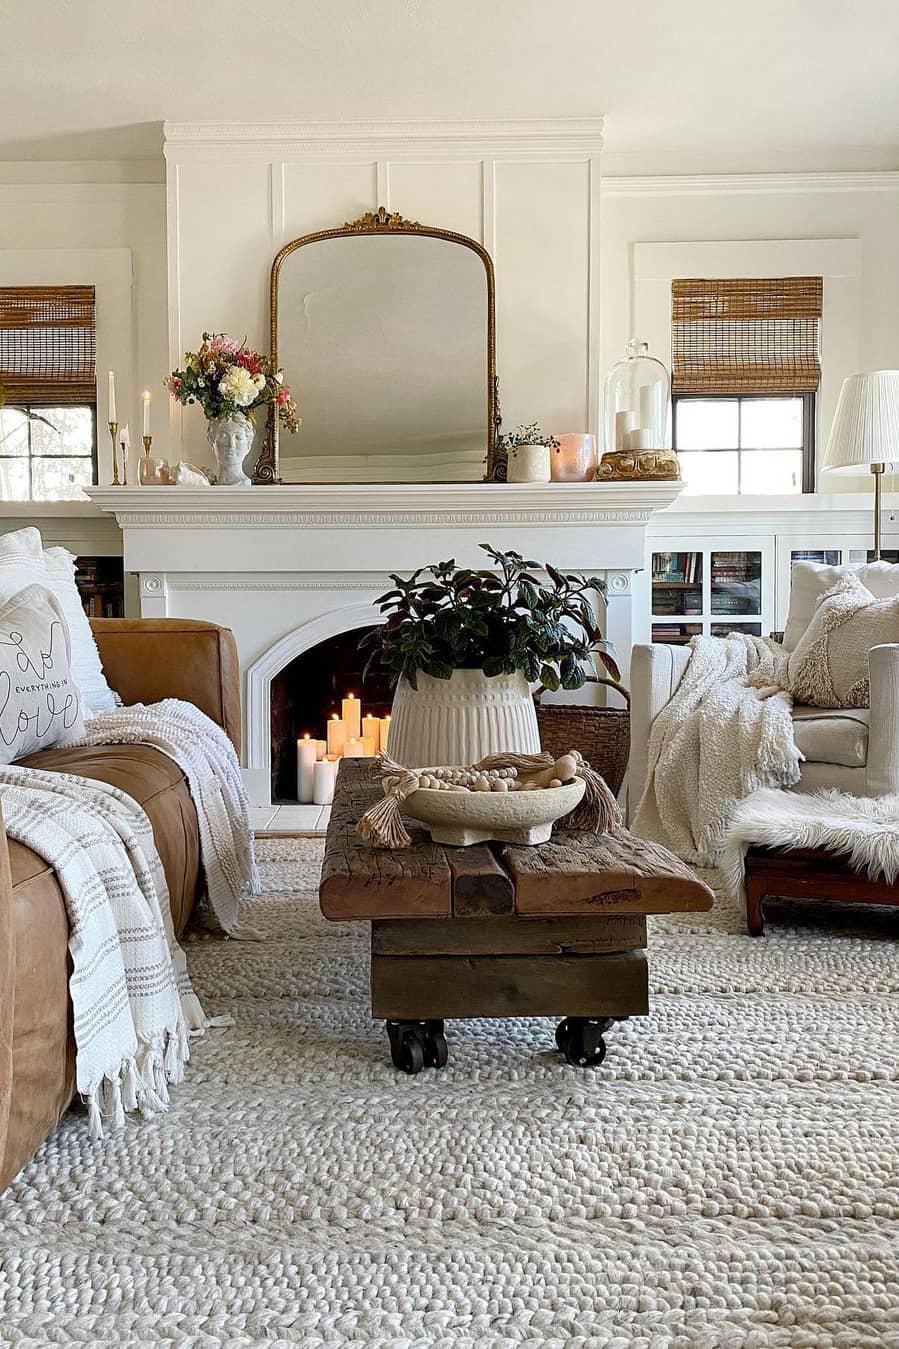 Simple rustic living room decoration